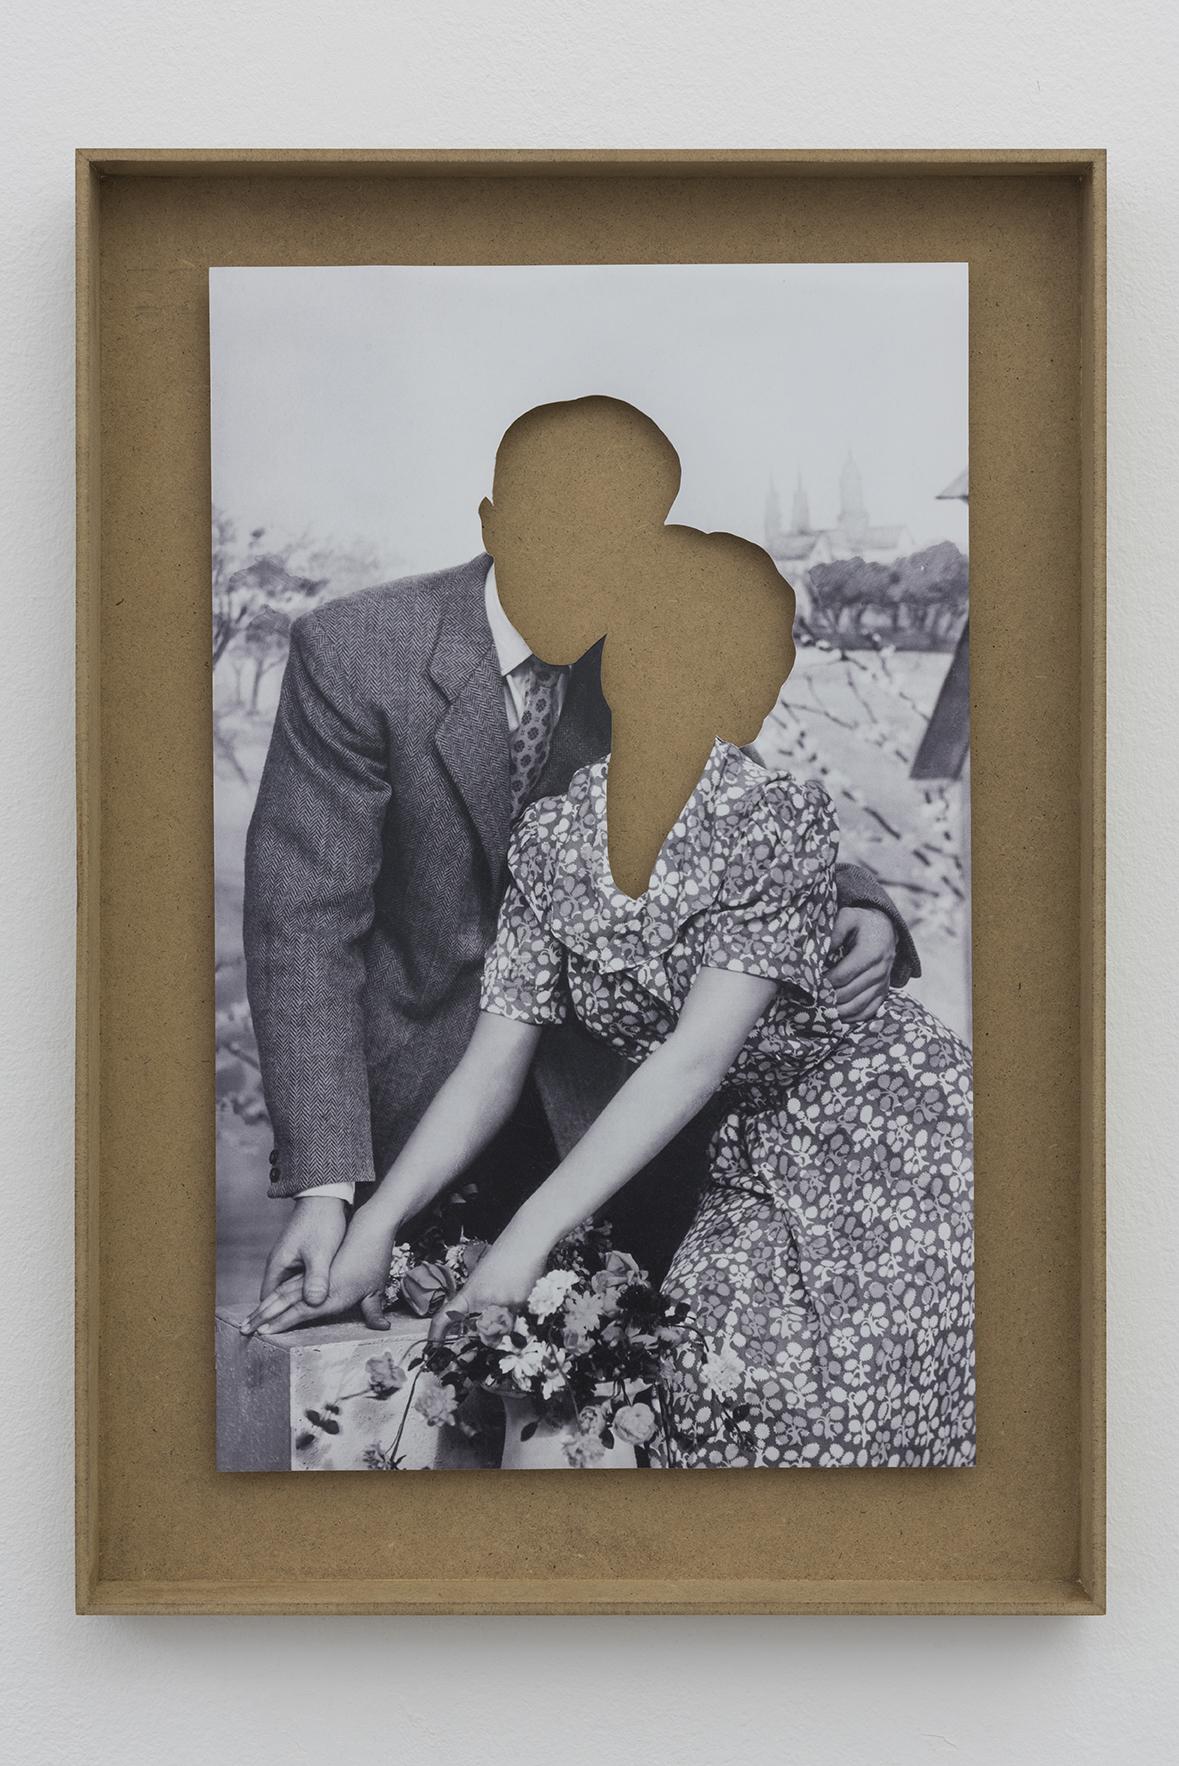 HANS-PETER FELDMANN.Love couple (2) , 2013 | ACCROCHAGE #1: Allen Ruppersberg et Al. | ProjecteSD